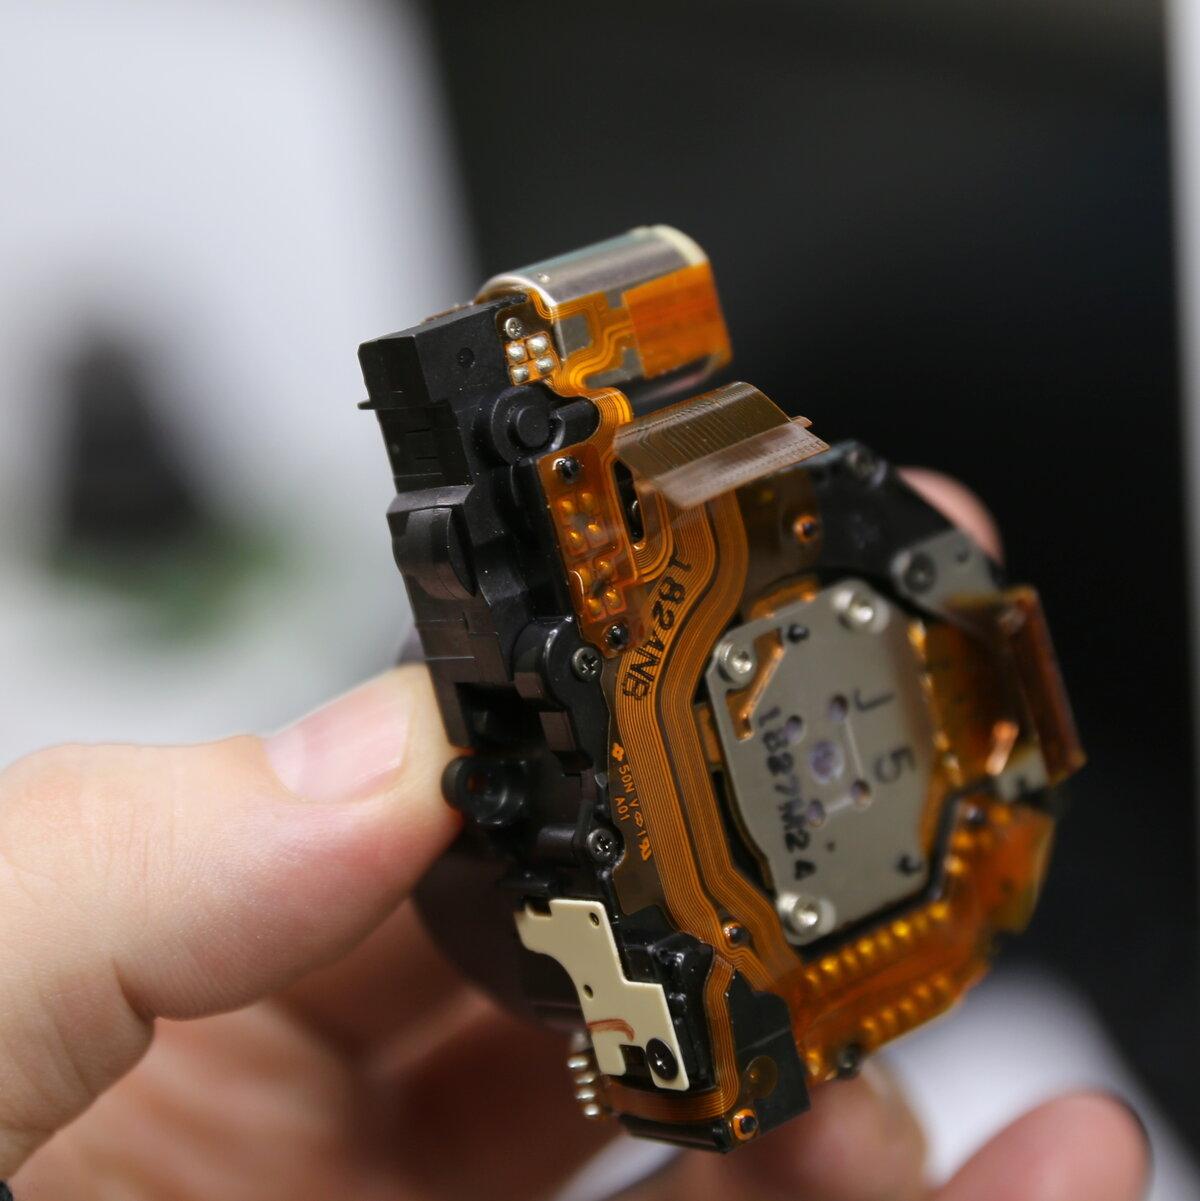 ремонт фотоаппаратов абакан предлагаем фотокниги премиум